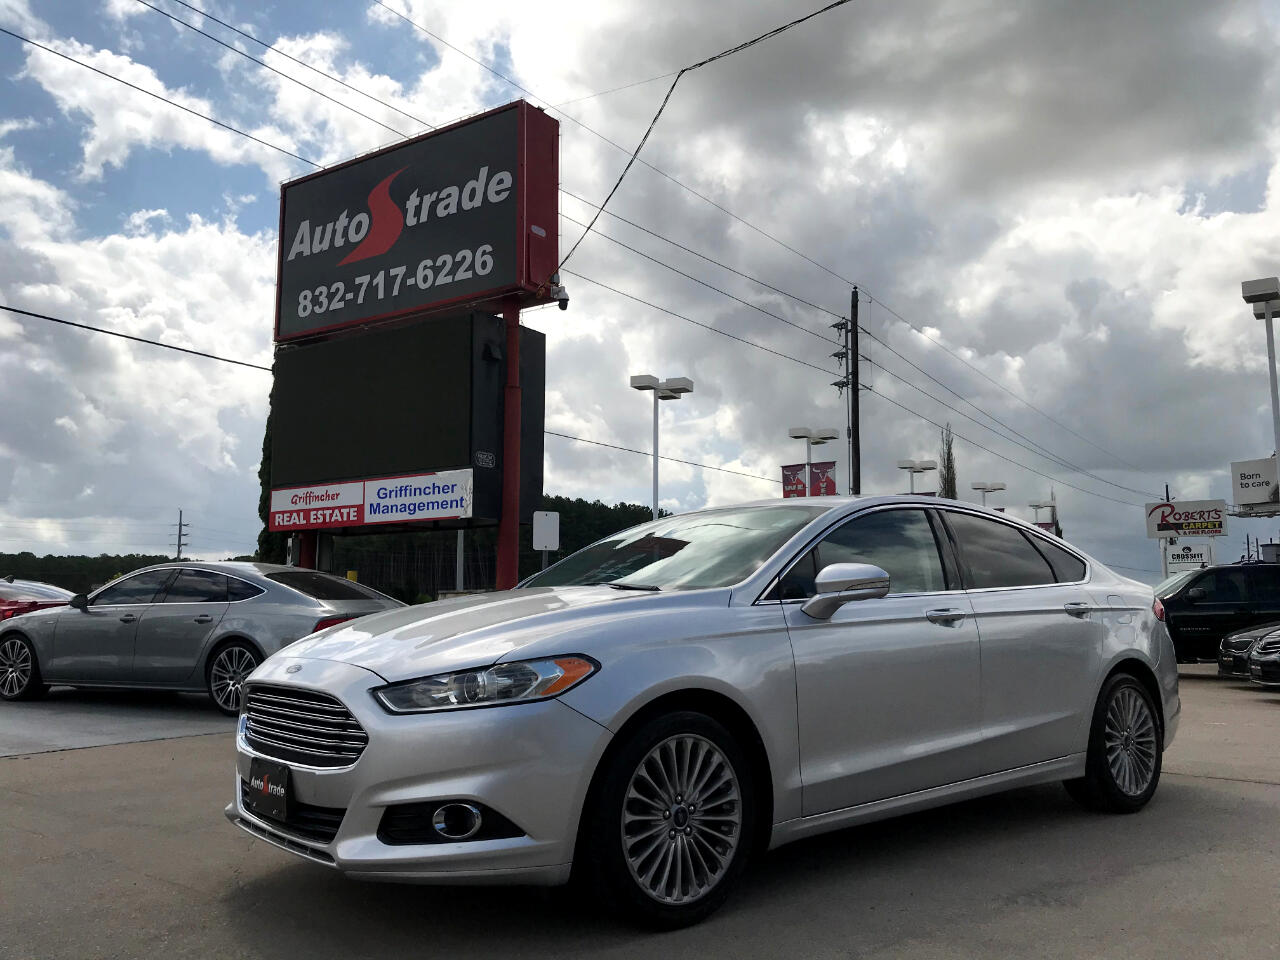 Ford Fusion 4dr Sdn Titanium FWD 2016